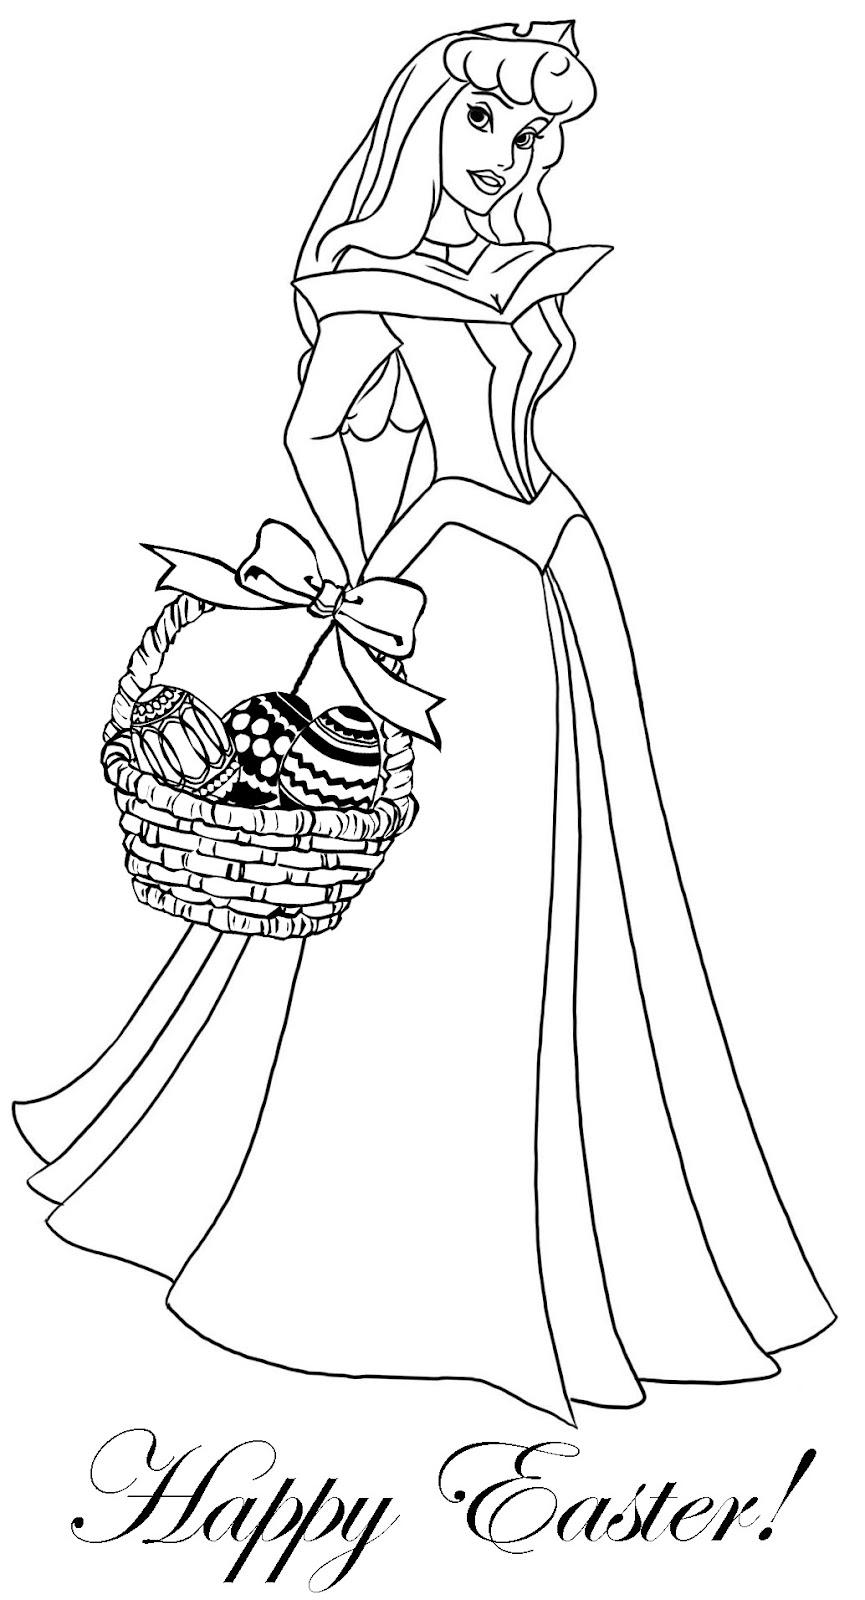 PRINCESS COLORING PAGES | colouring pages disney princess printable